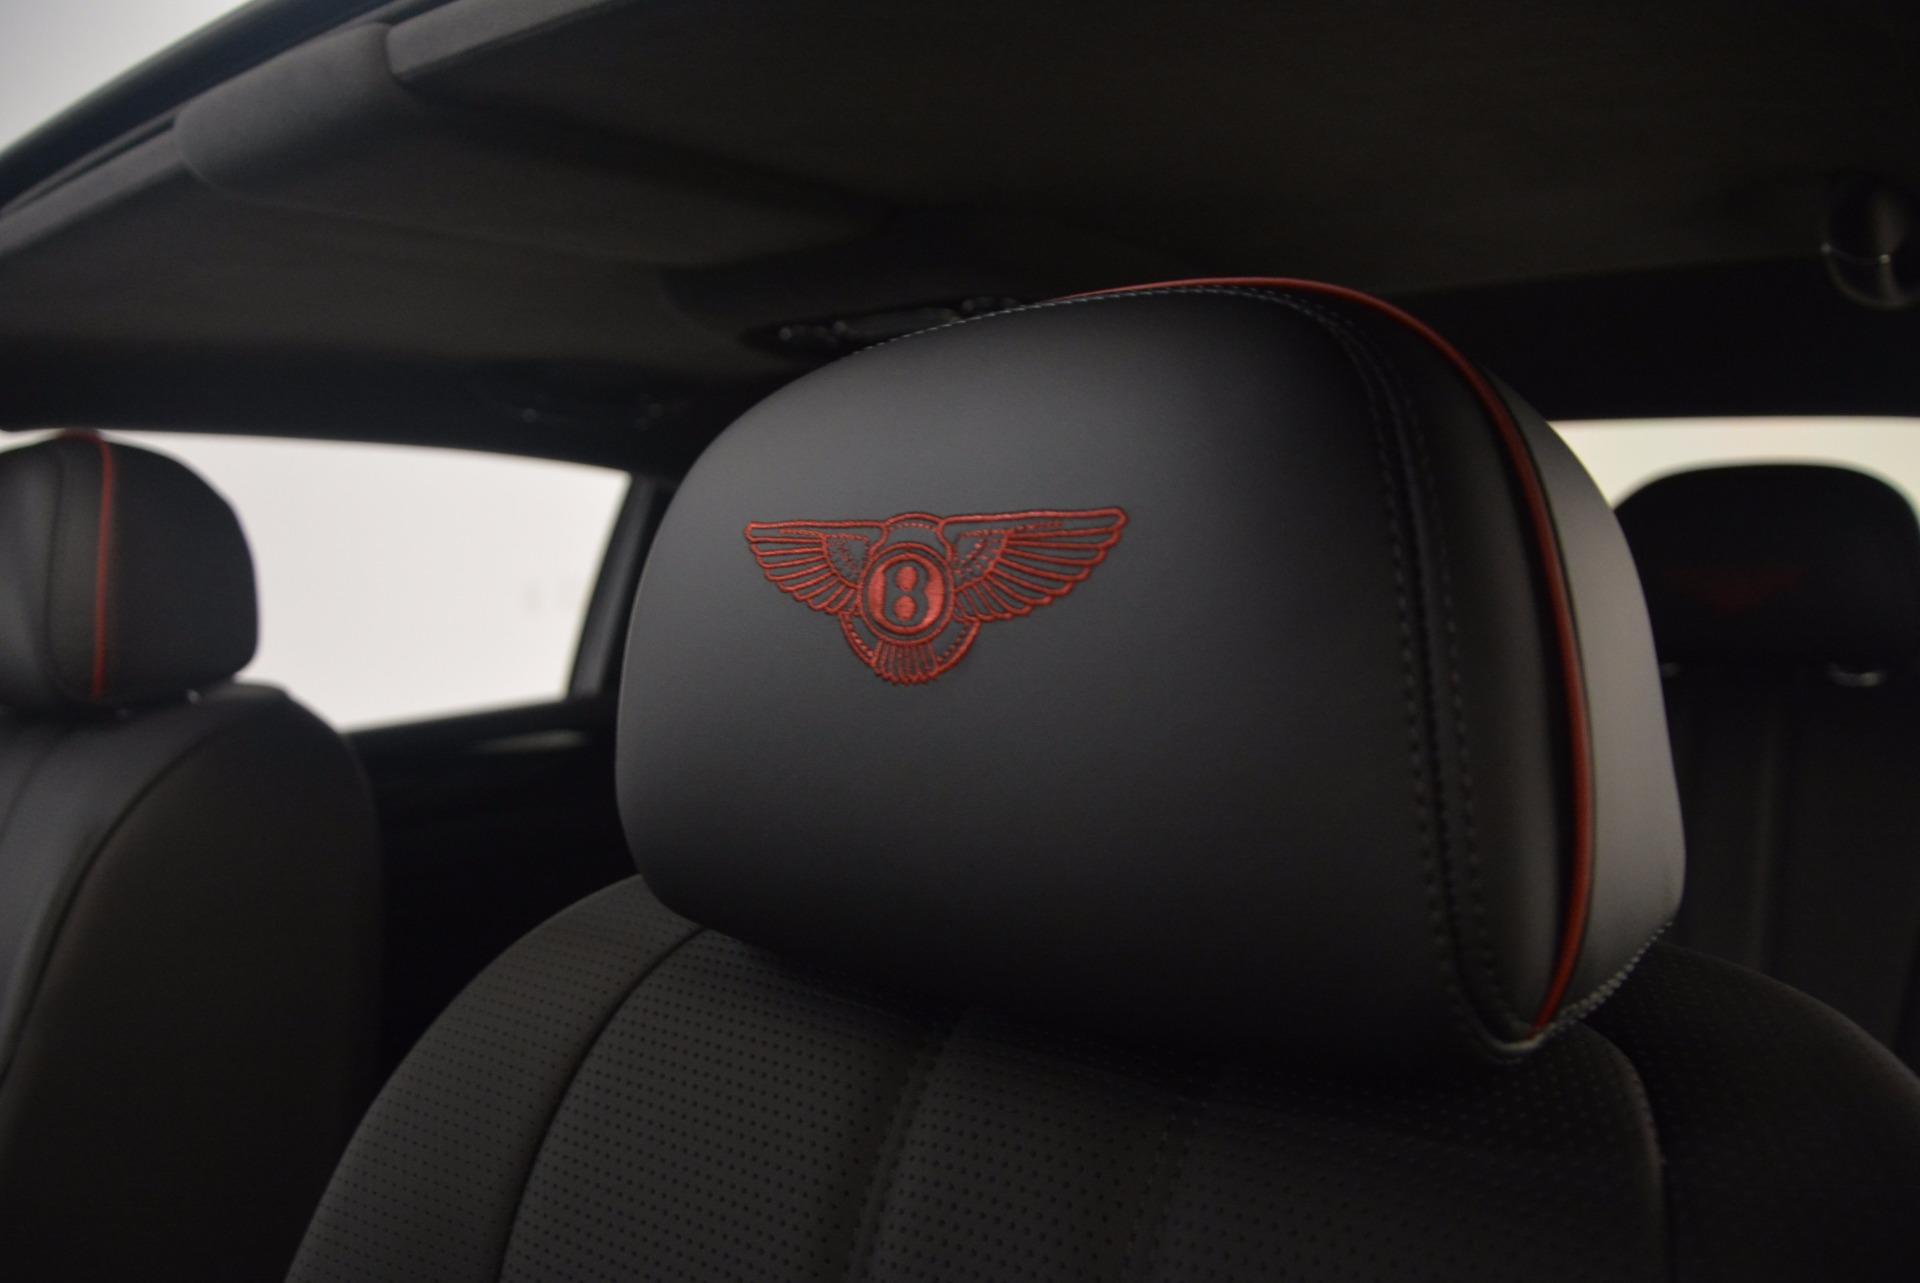 Used 2015 Bentley Flying Spur V8 For Sale In Westport, CT 1199_p25